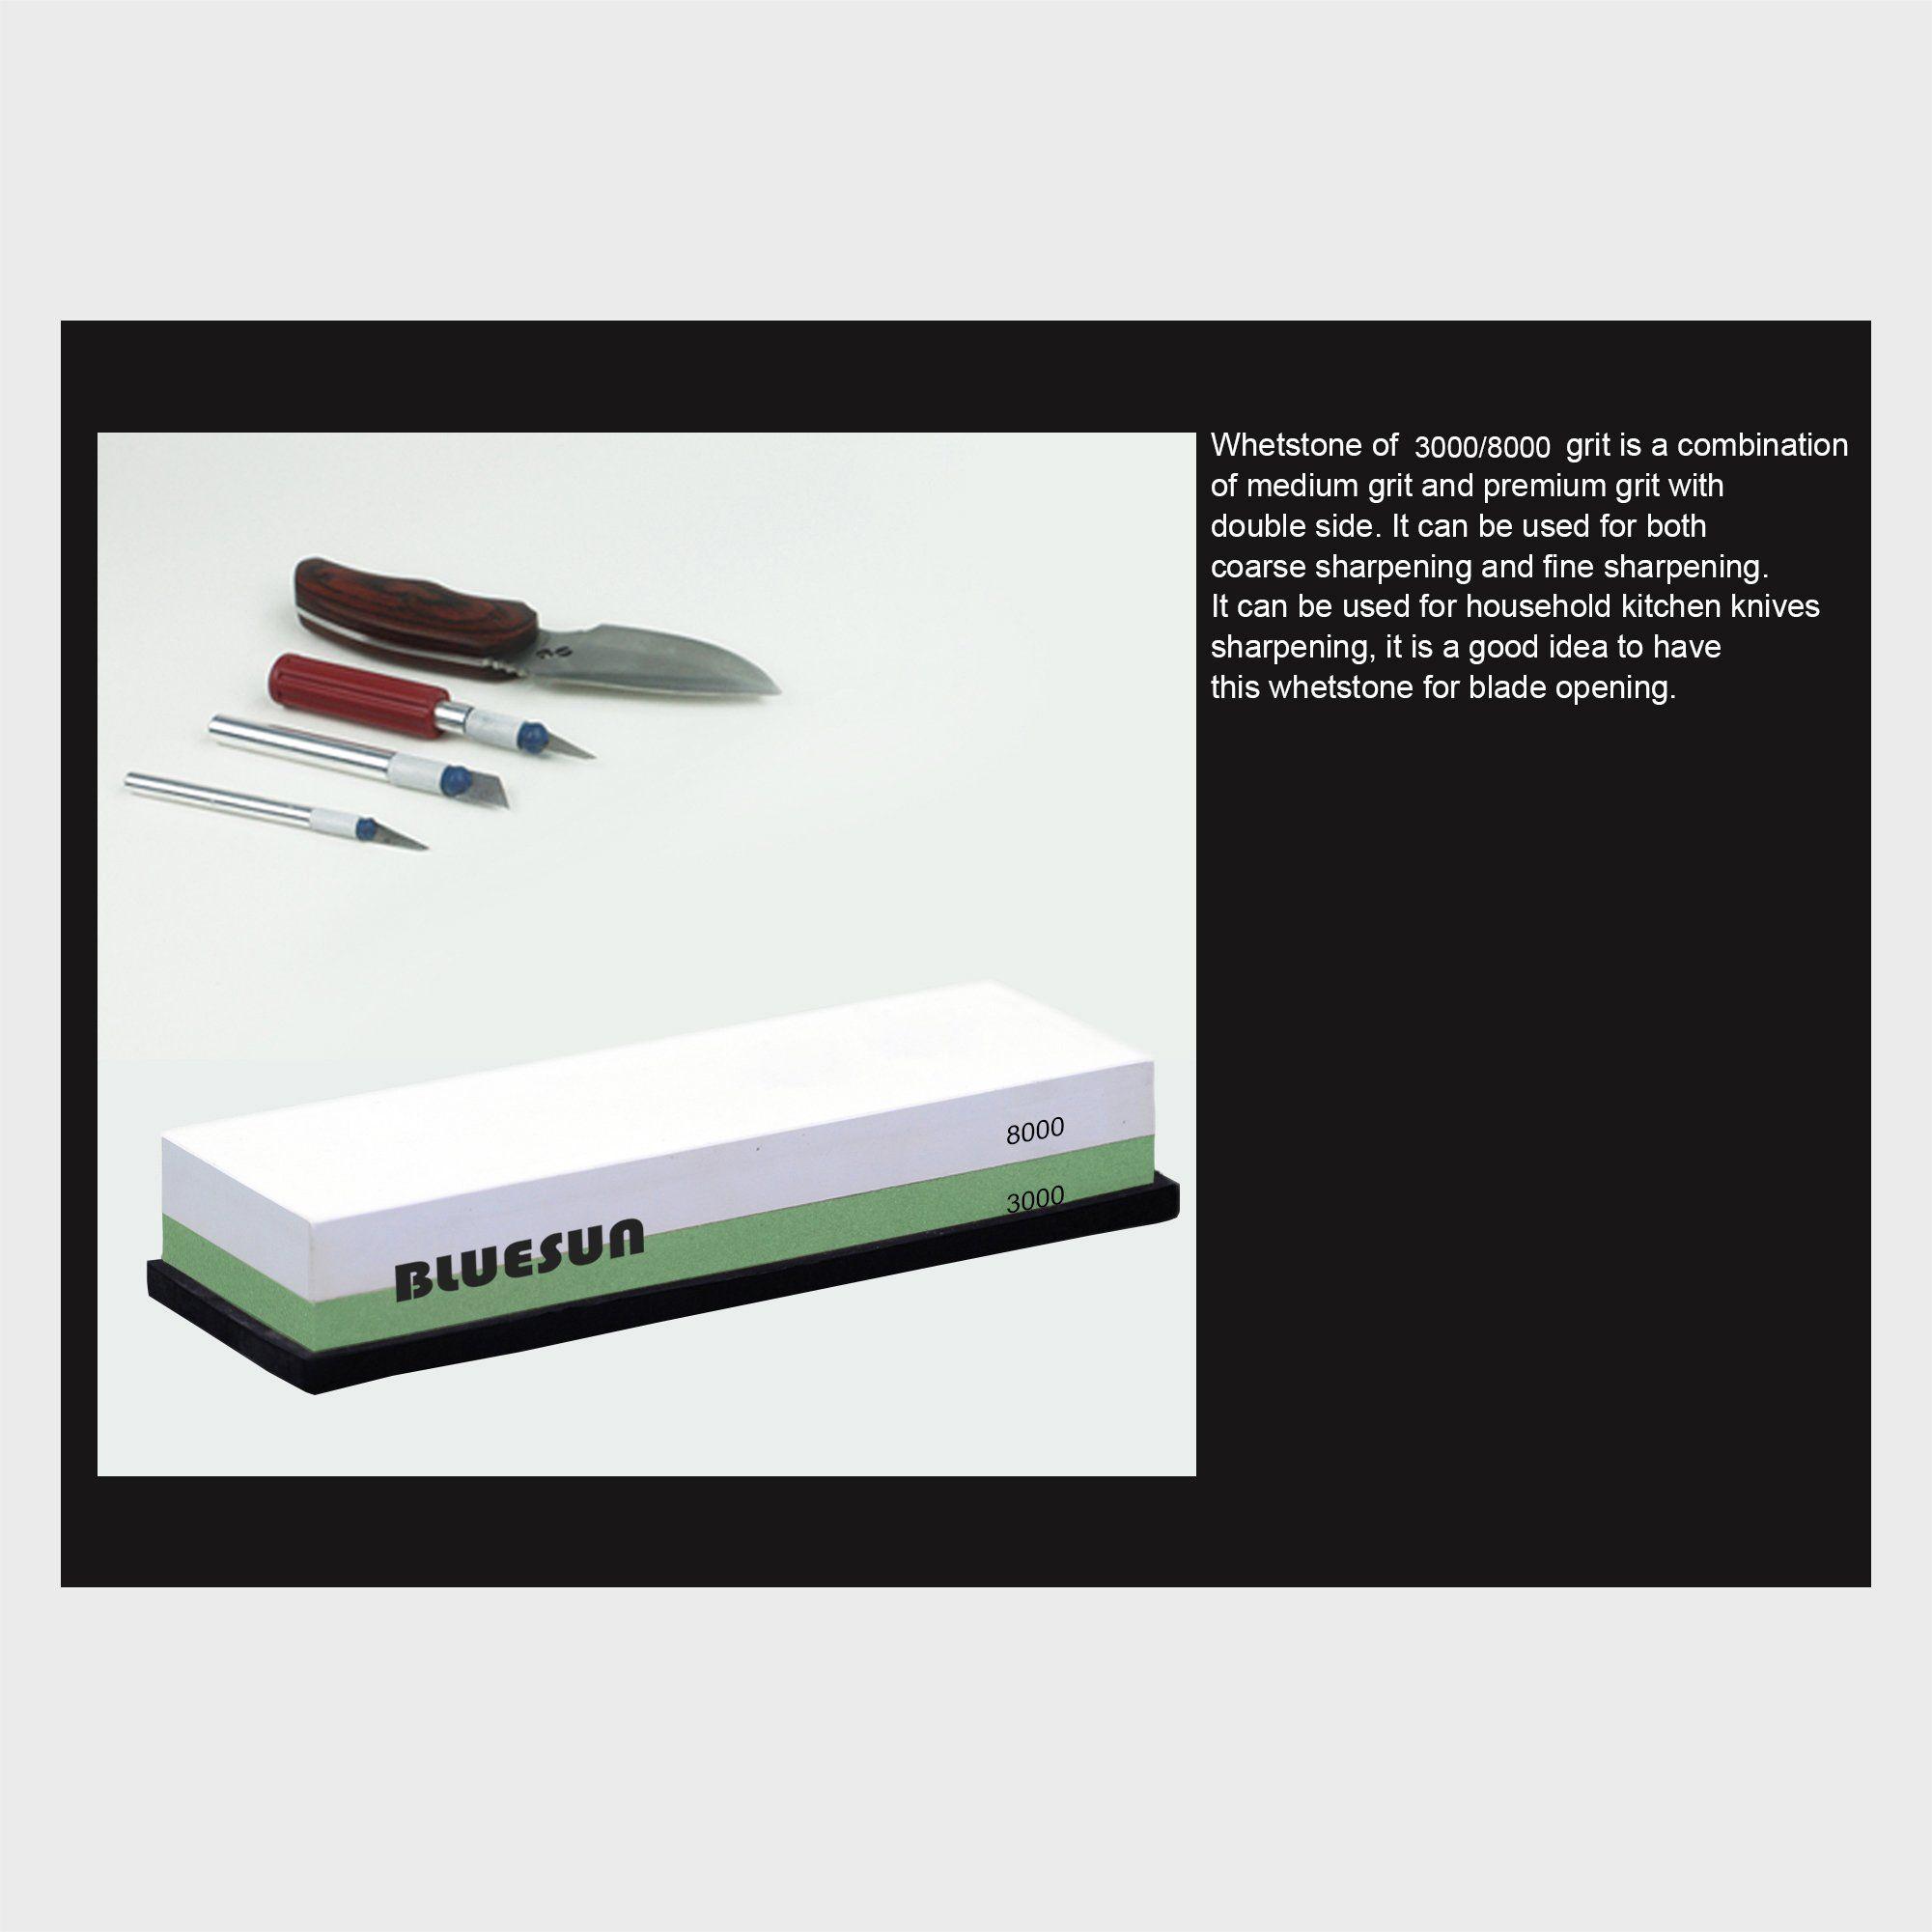 Bluesun Knife Sharpening Sharpener Stone Whetstone Waterstone 3000 8000 Grit Silicon Nonslip B In 2020 Kitchen Knife Sharpening Knife Sharpening Knife Sharpening Stone